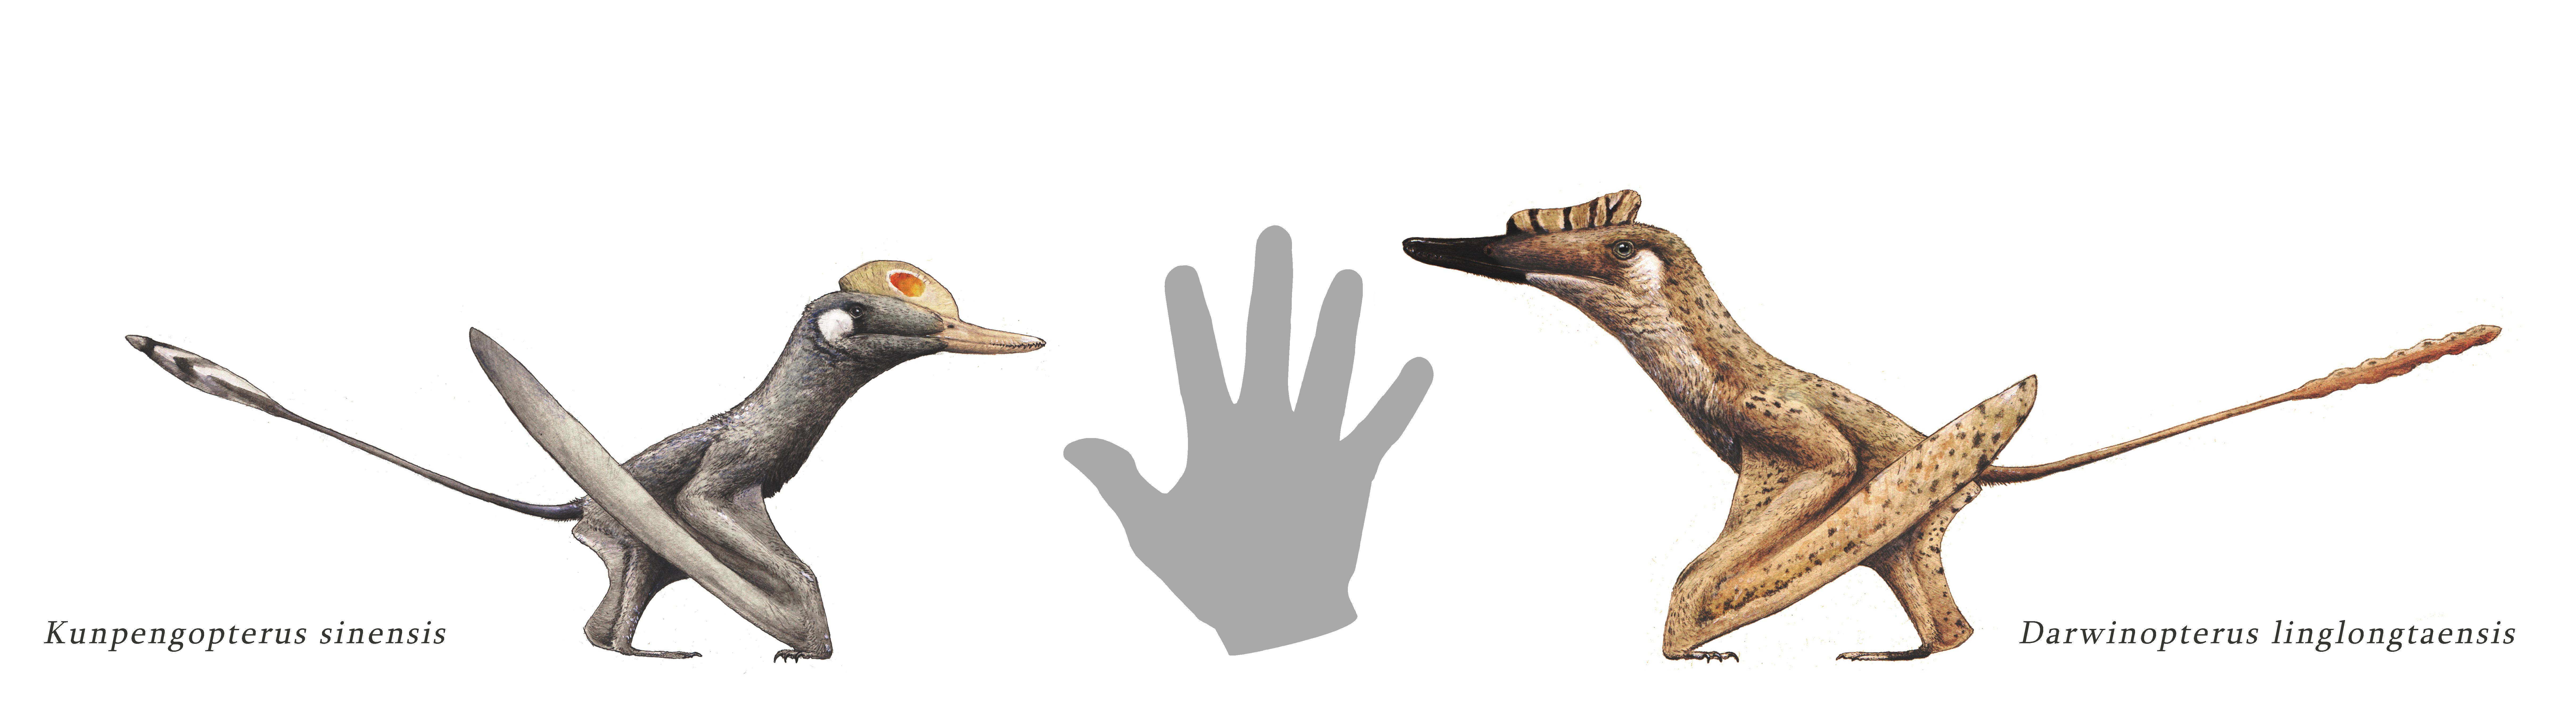 Pin by Saille on paleo-concept   Creature concept art. Paleo art. Prehistoric animals